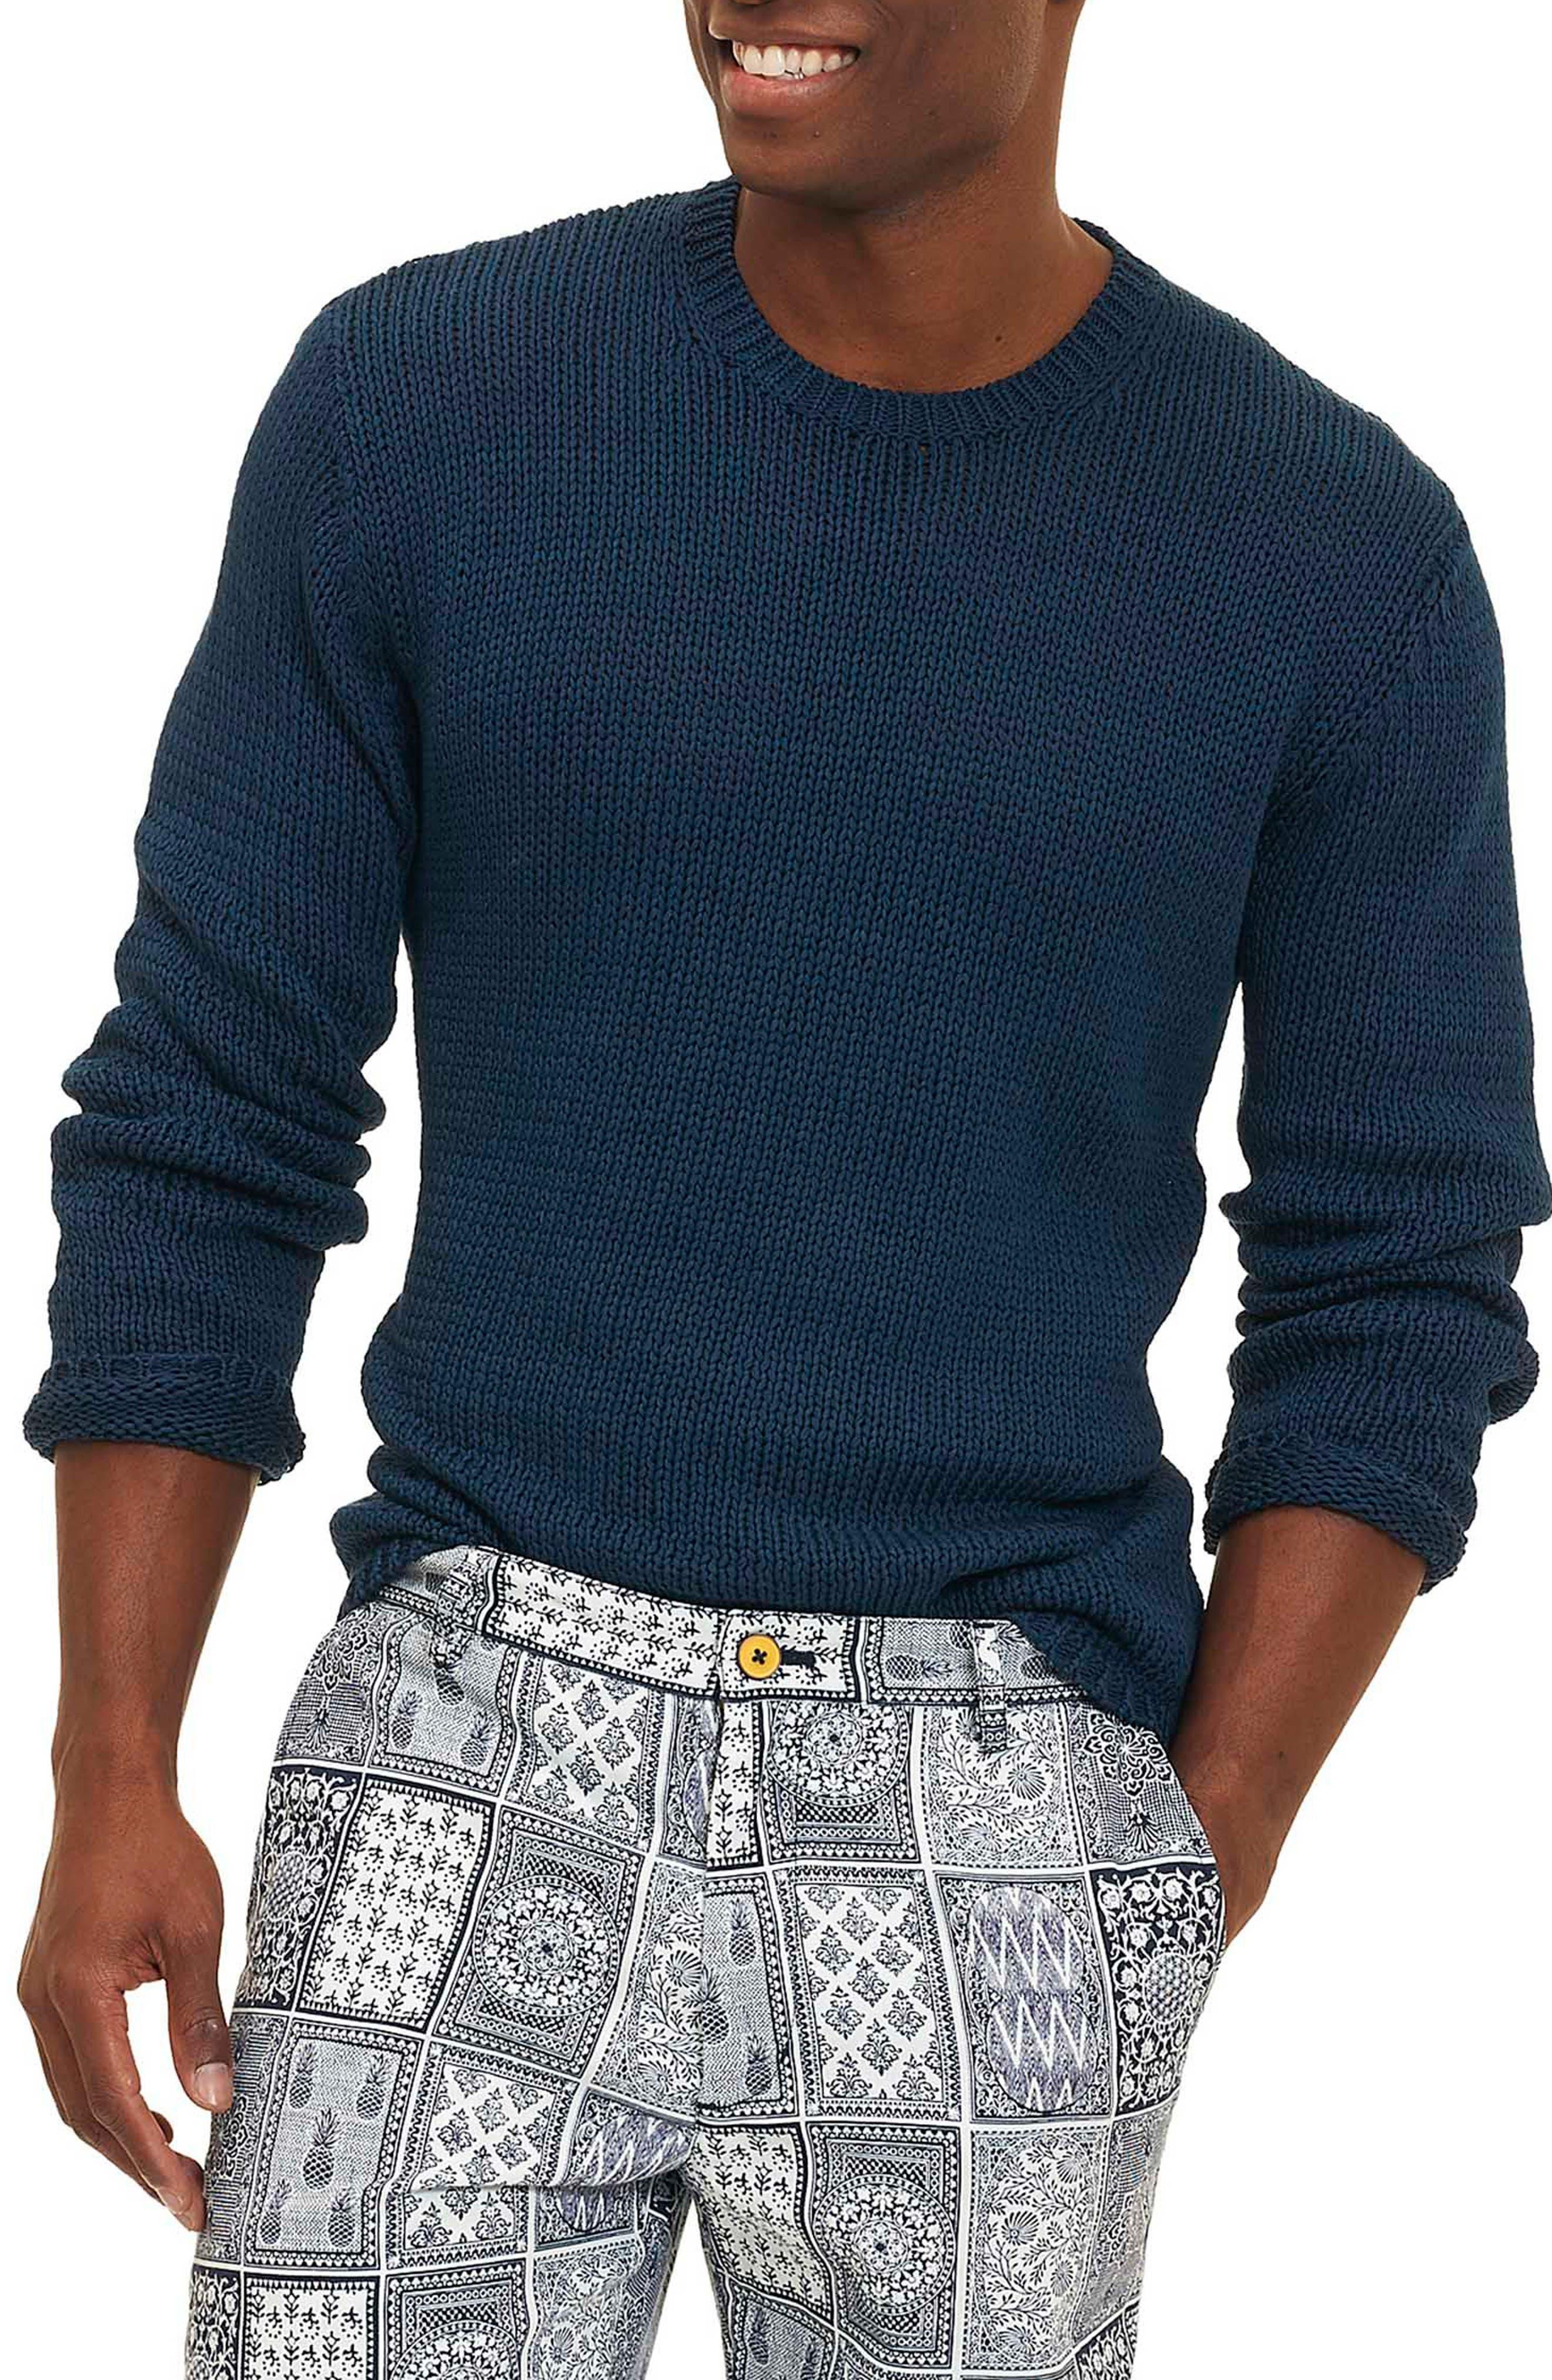 Keratons Sweater,                             Main thumbnail 1, color,                             Blue